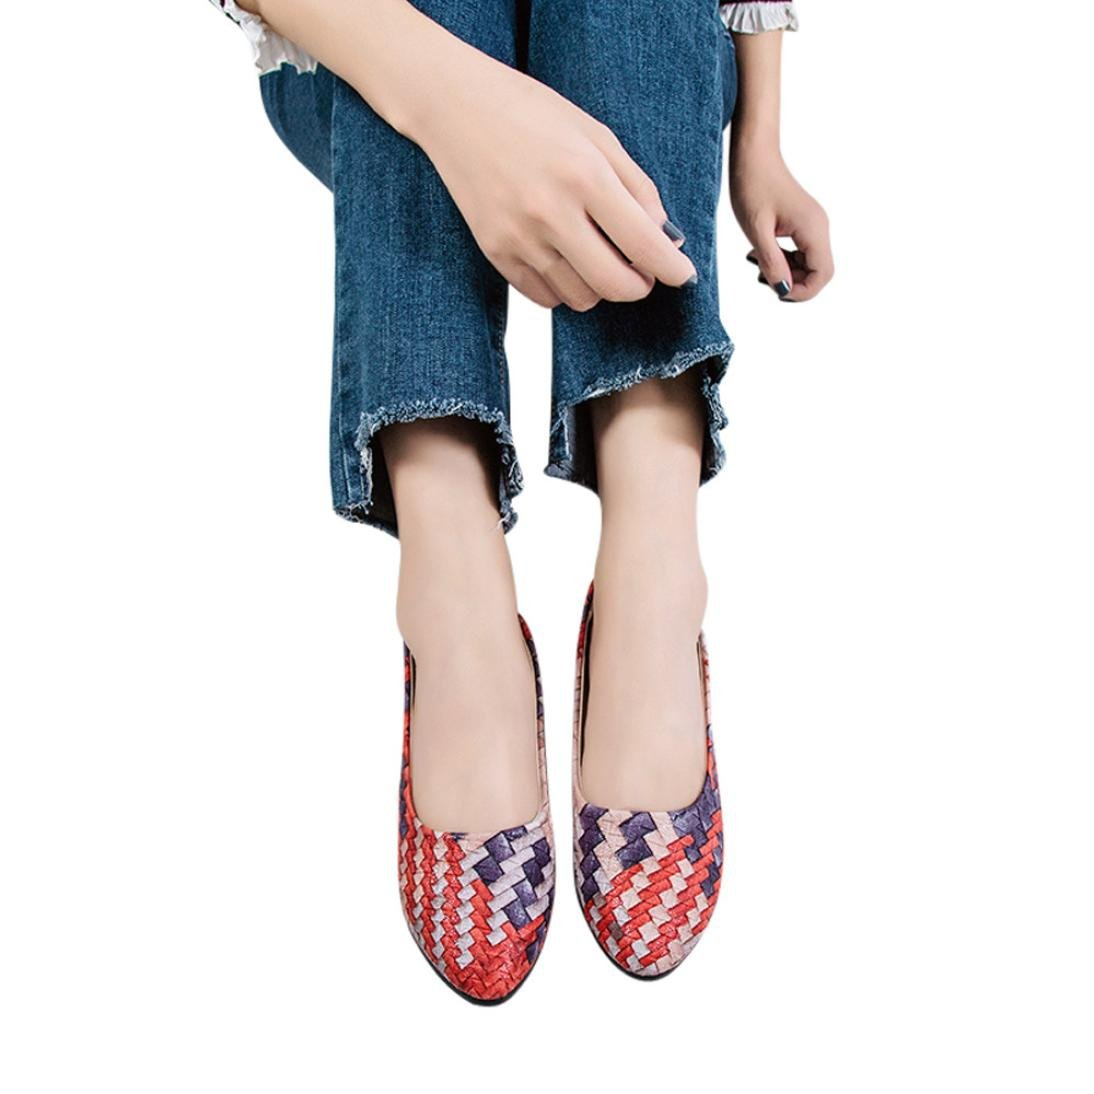 8ad3cf06a41943 aimtoppy hot sale women bow summer sandals slipper indoor outdoor flip  flops beach shoes us 7.5 blue cozy fresh 56936 6c56d